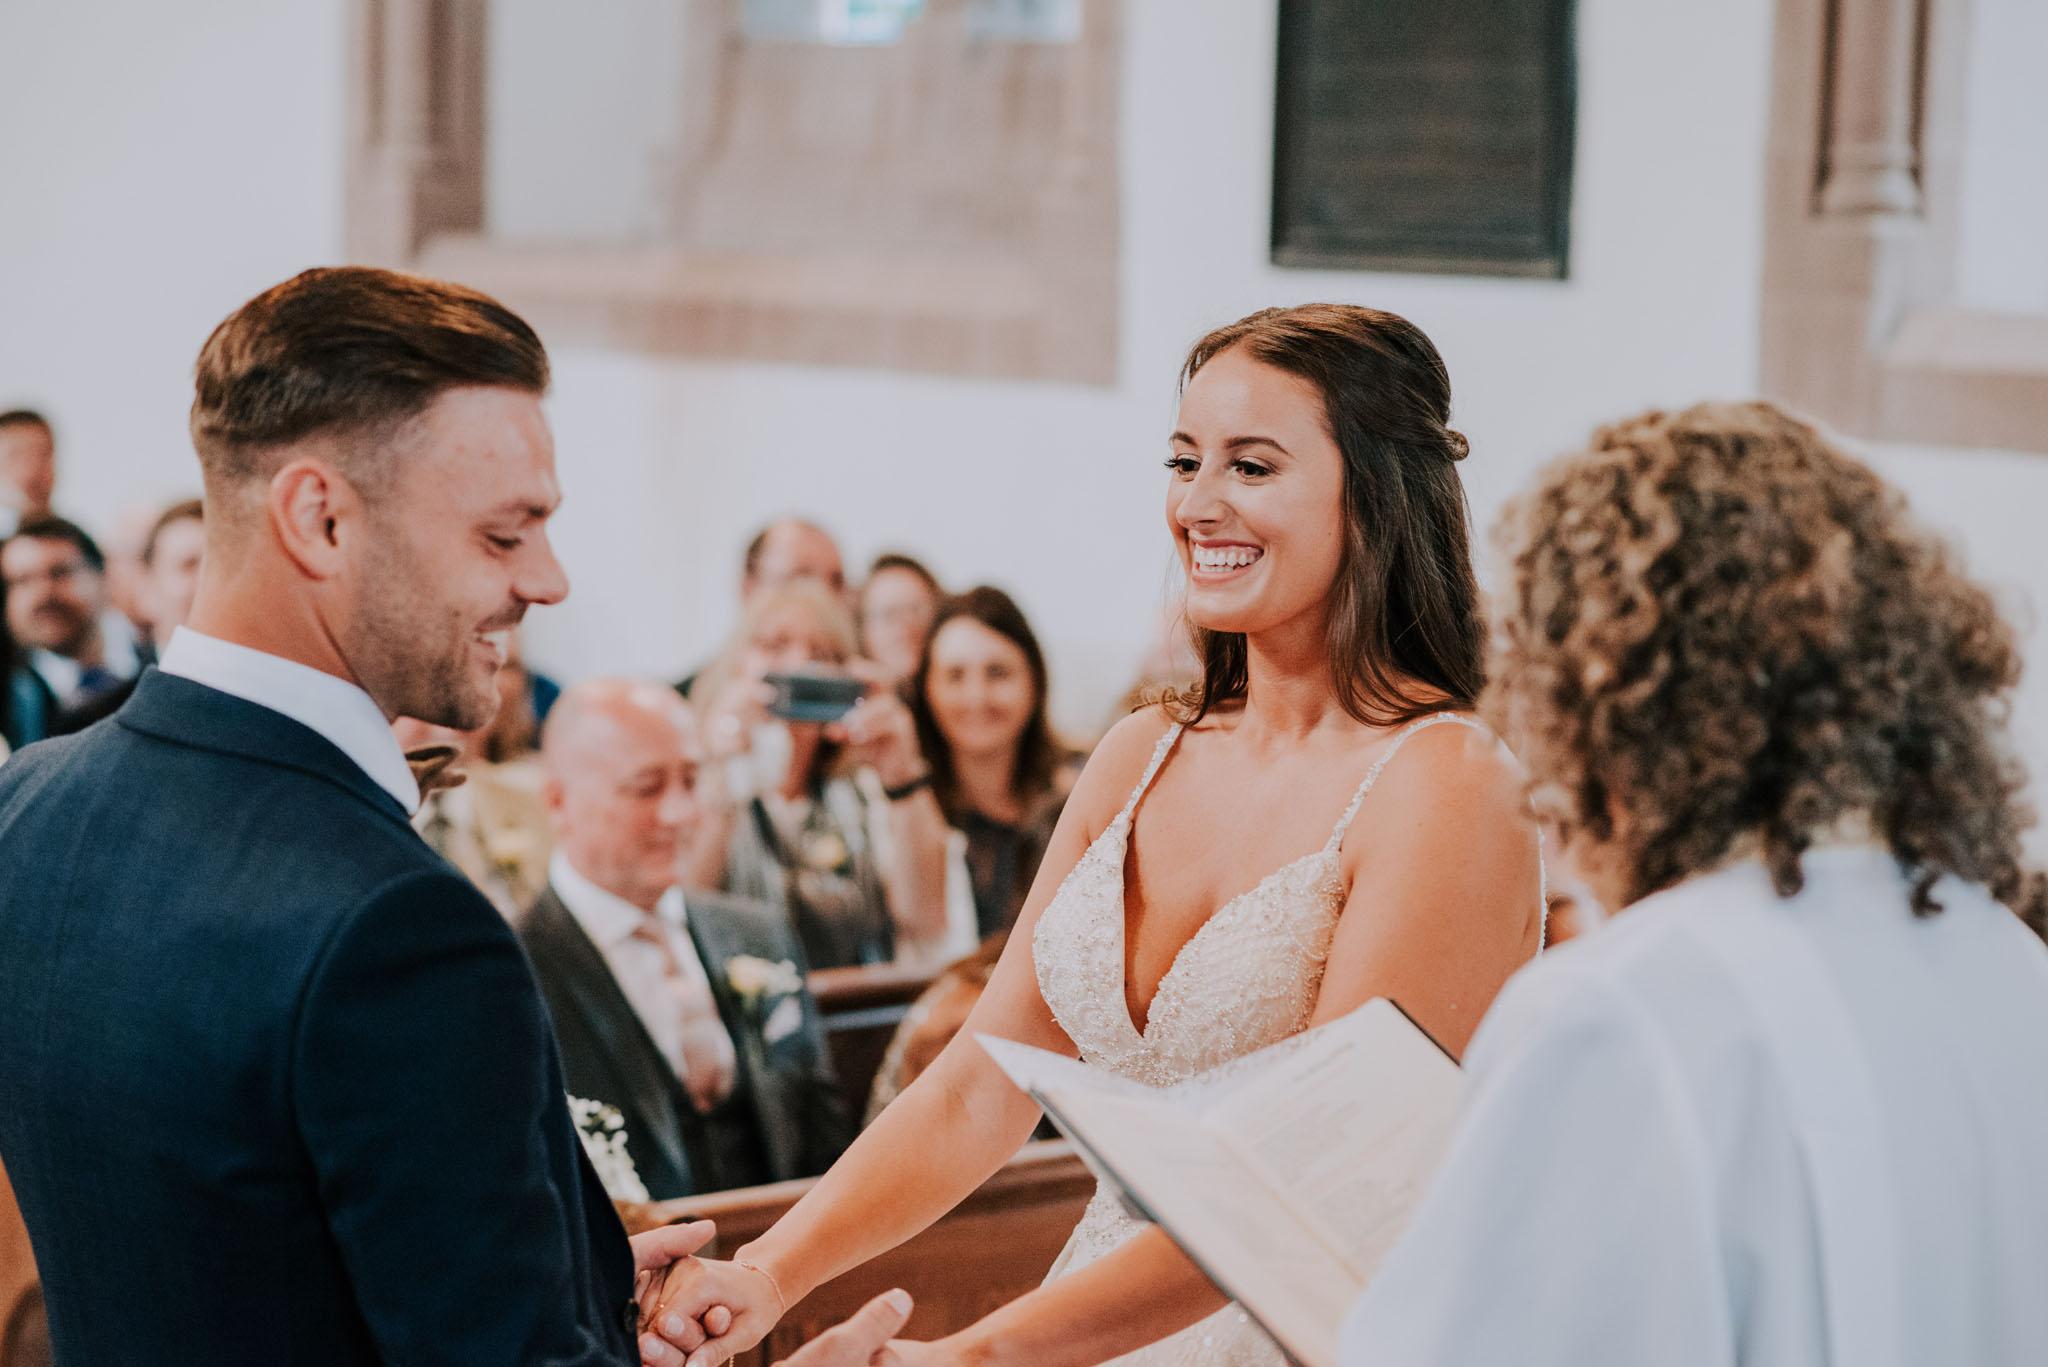 wedding-photographer-glewstone-court-hereford-scott-stockwell-photography186.jpg